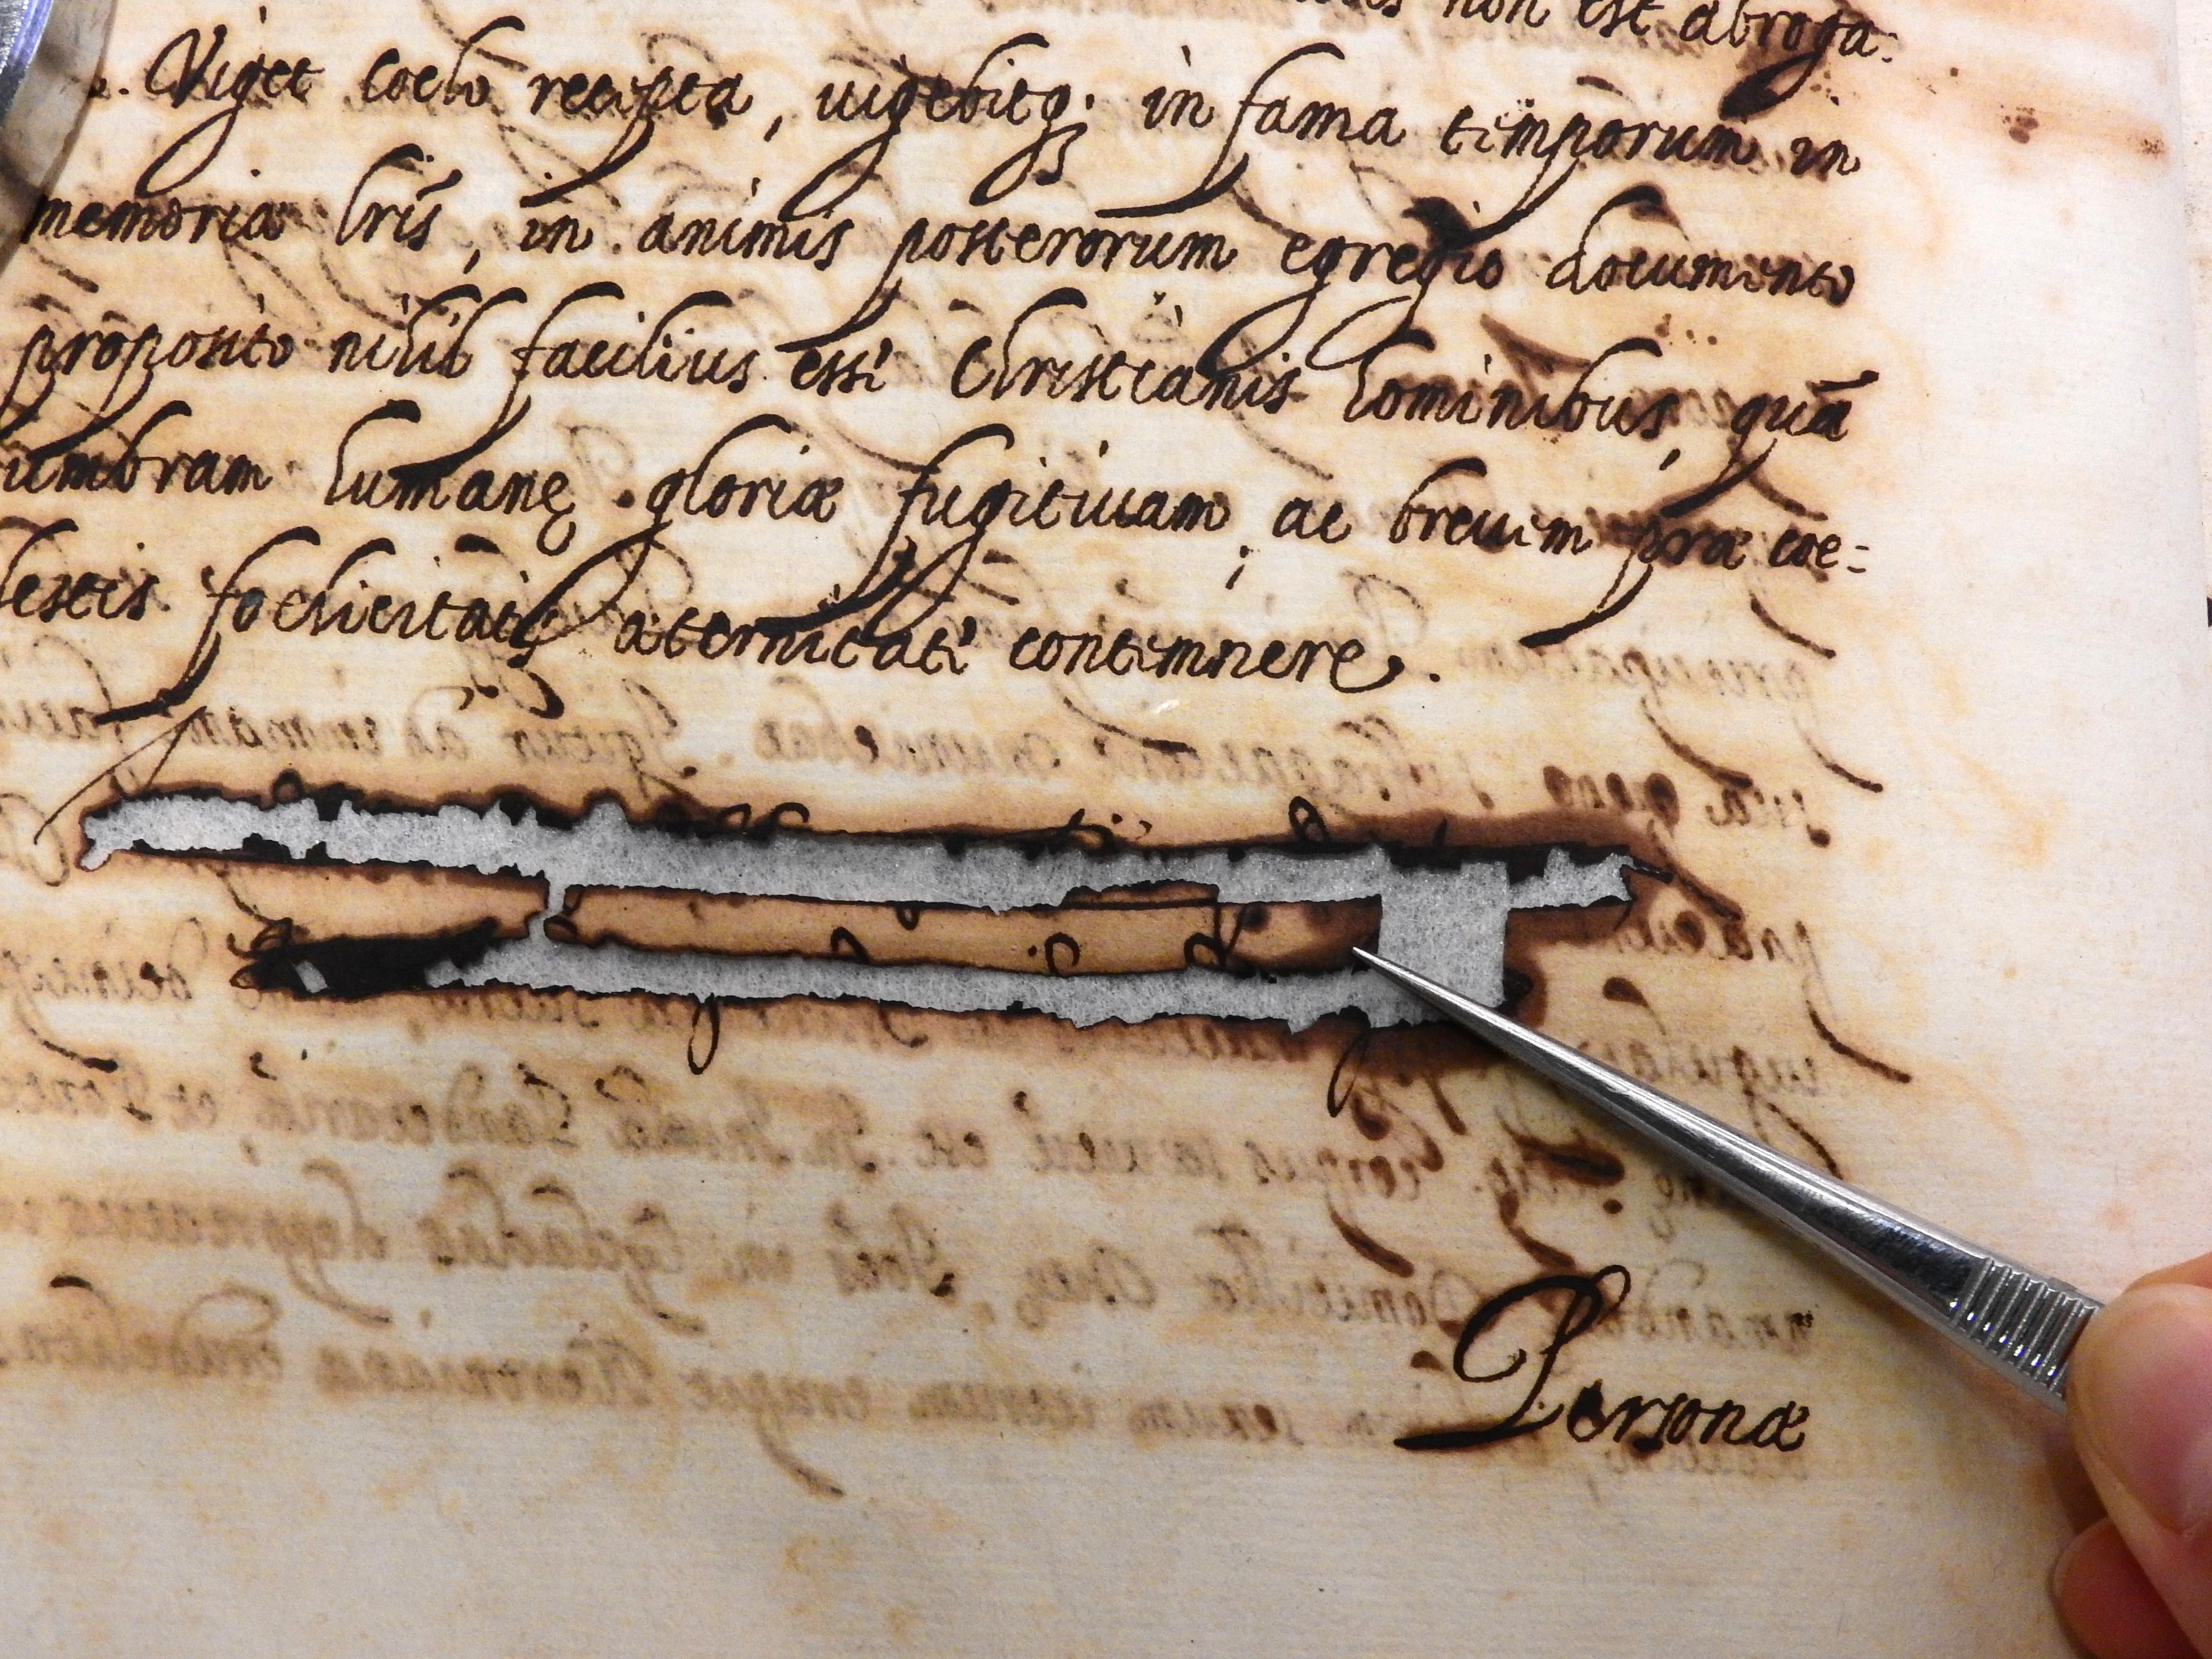 librarti-serena-dominijanni-bookbinders-roma-thumbnail